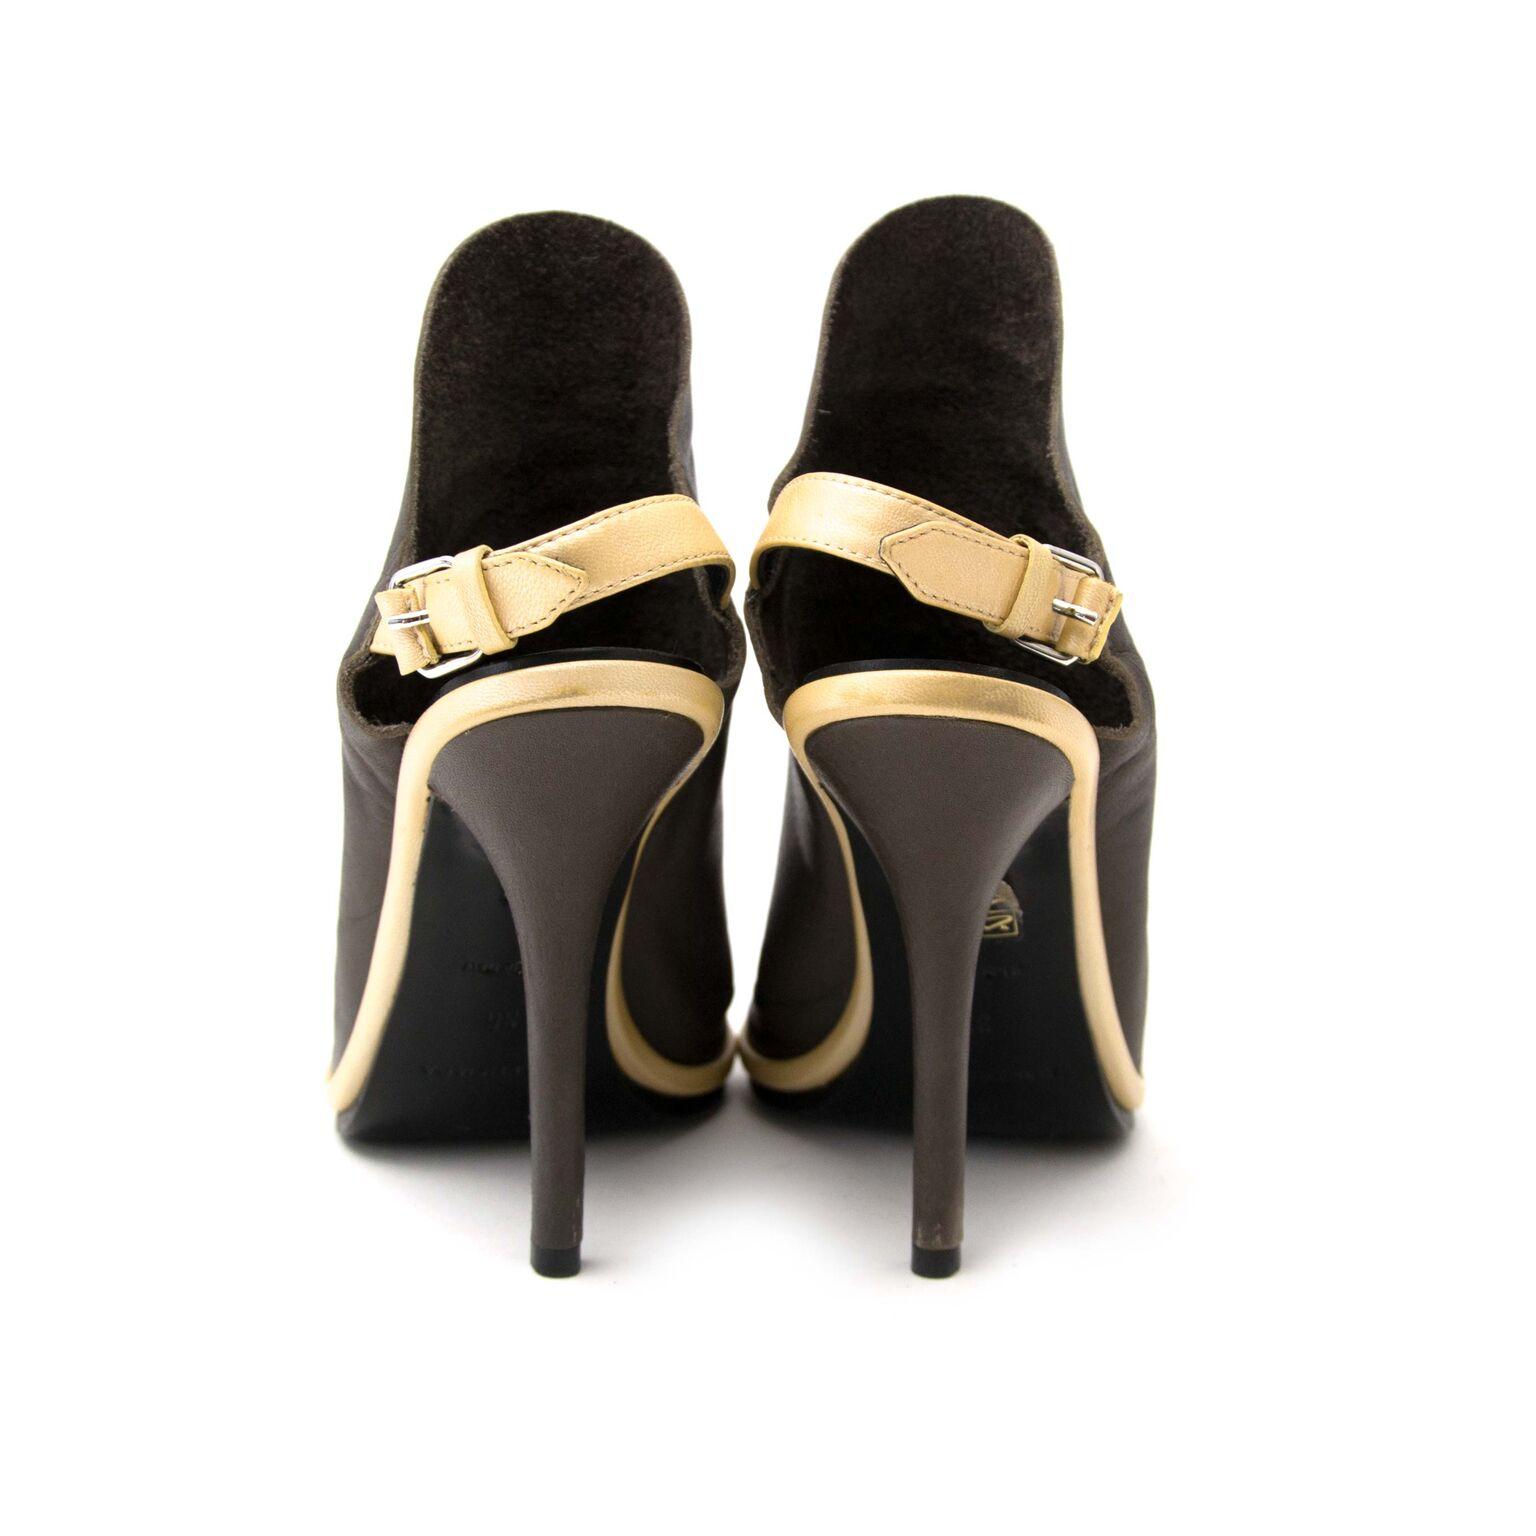 Koop nu authentieke designer schoenen van Balenciaga op labellov.com